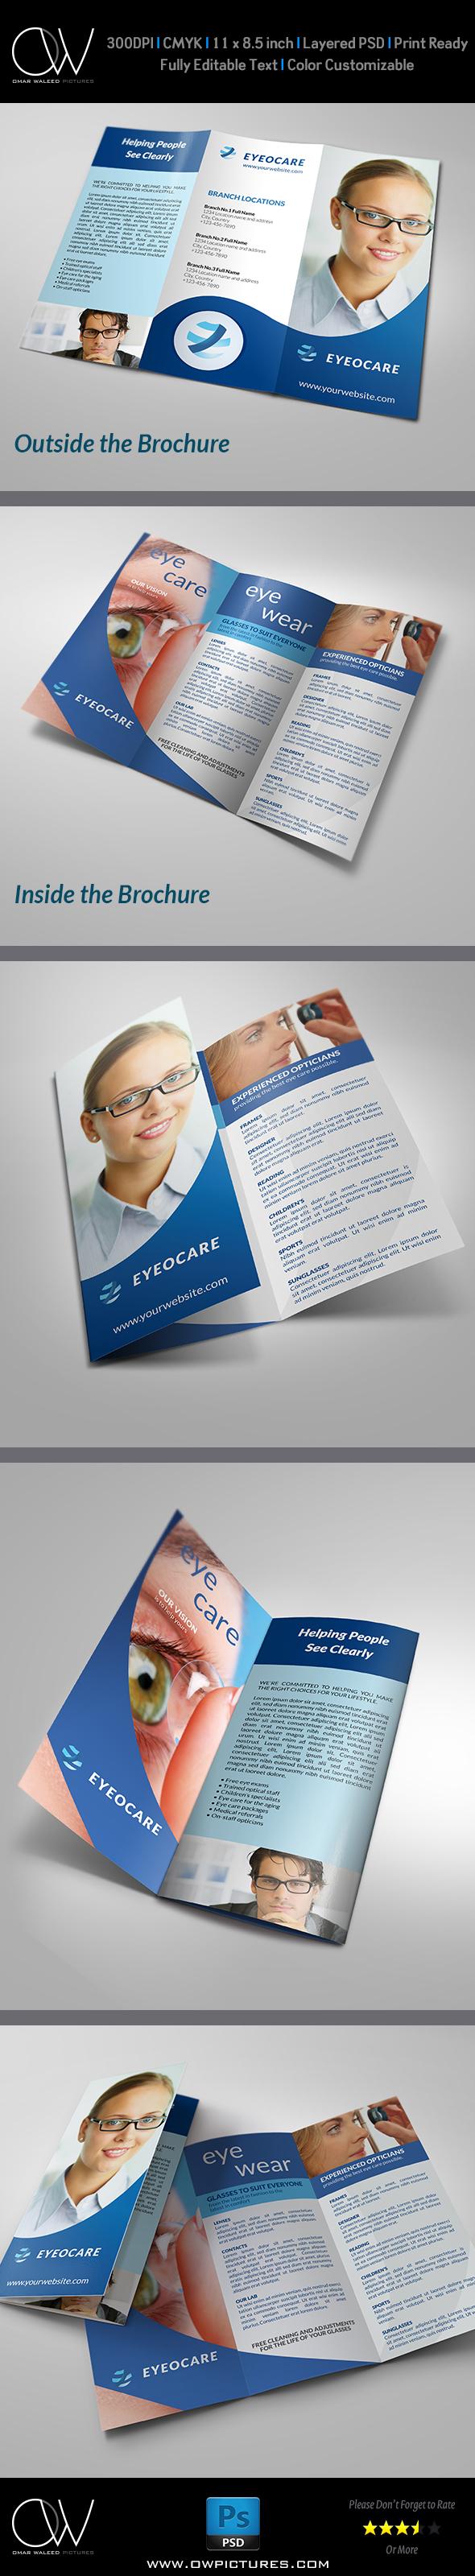 Optometrist & Optician Tri-Fold Brochure Template on Behance